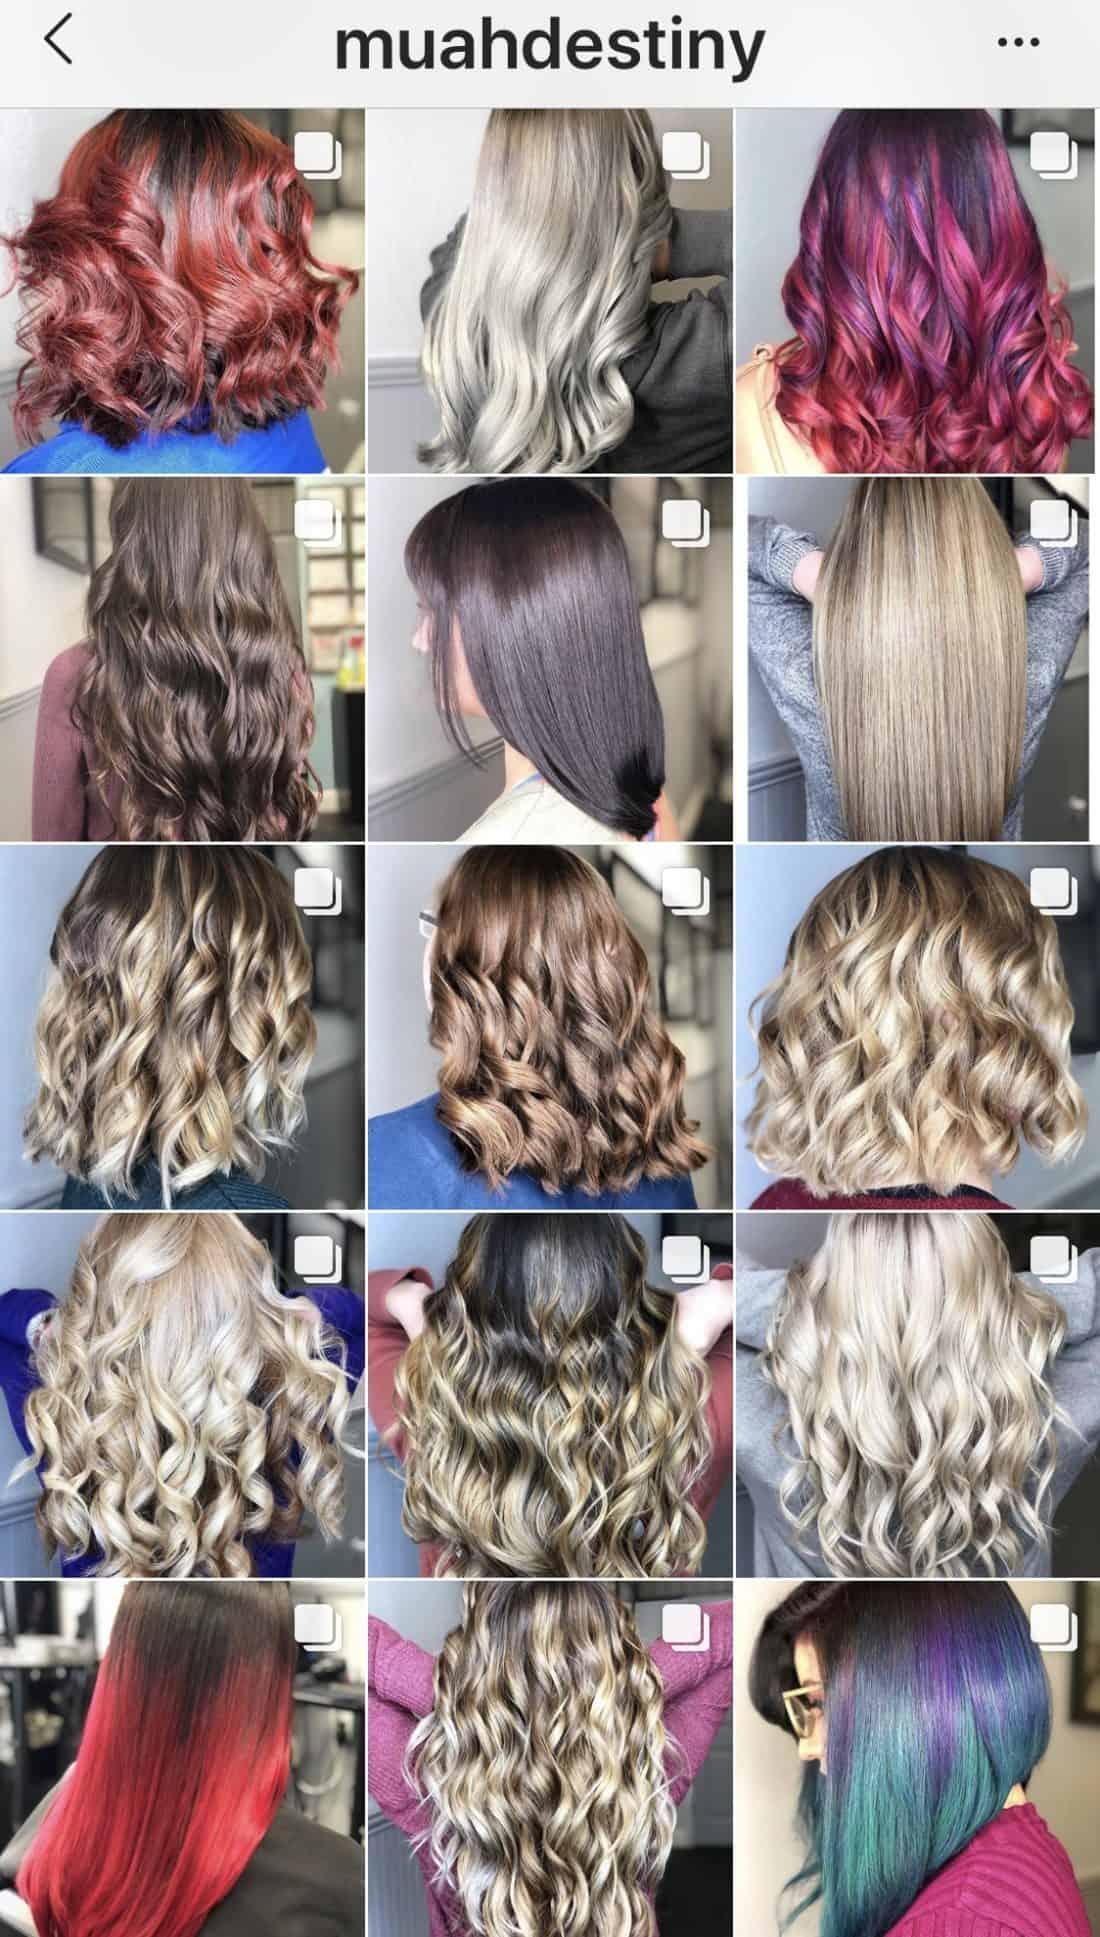 ShaundaNecole.com | @MUAHdestiny Instagram | Hampton Roads Hair Stylists & Color Specialist